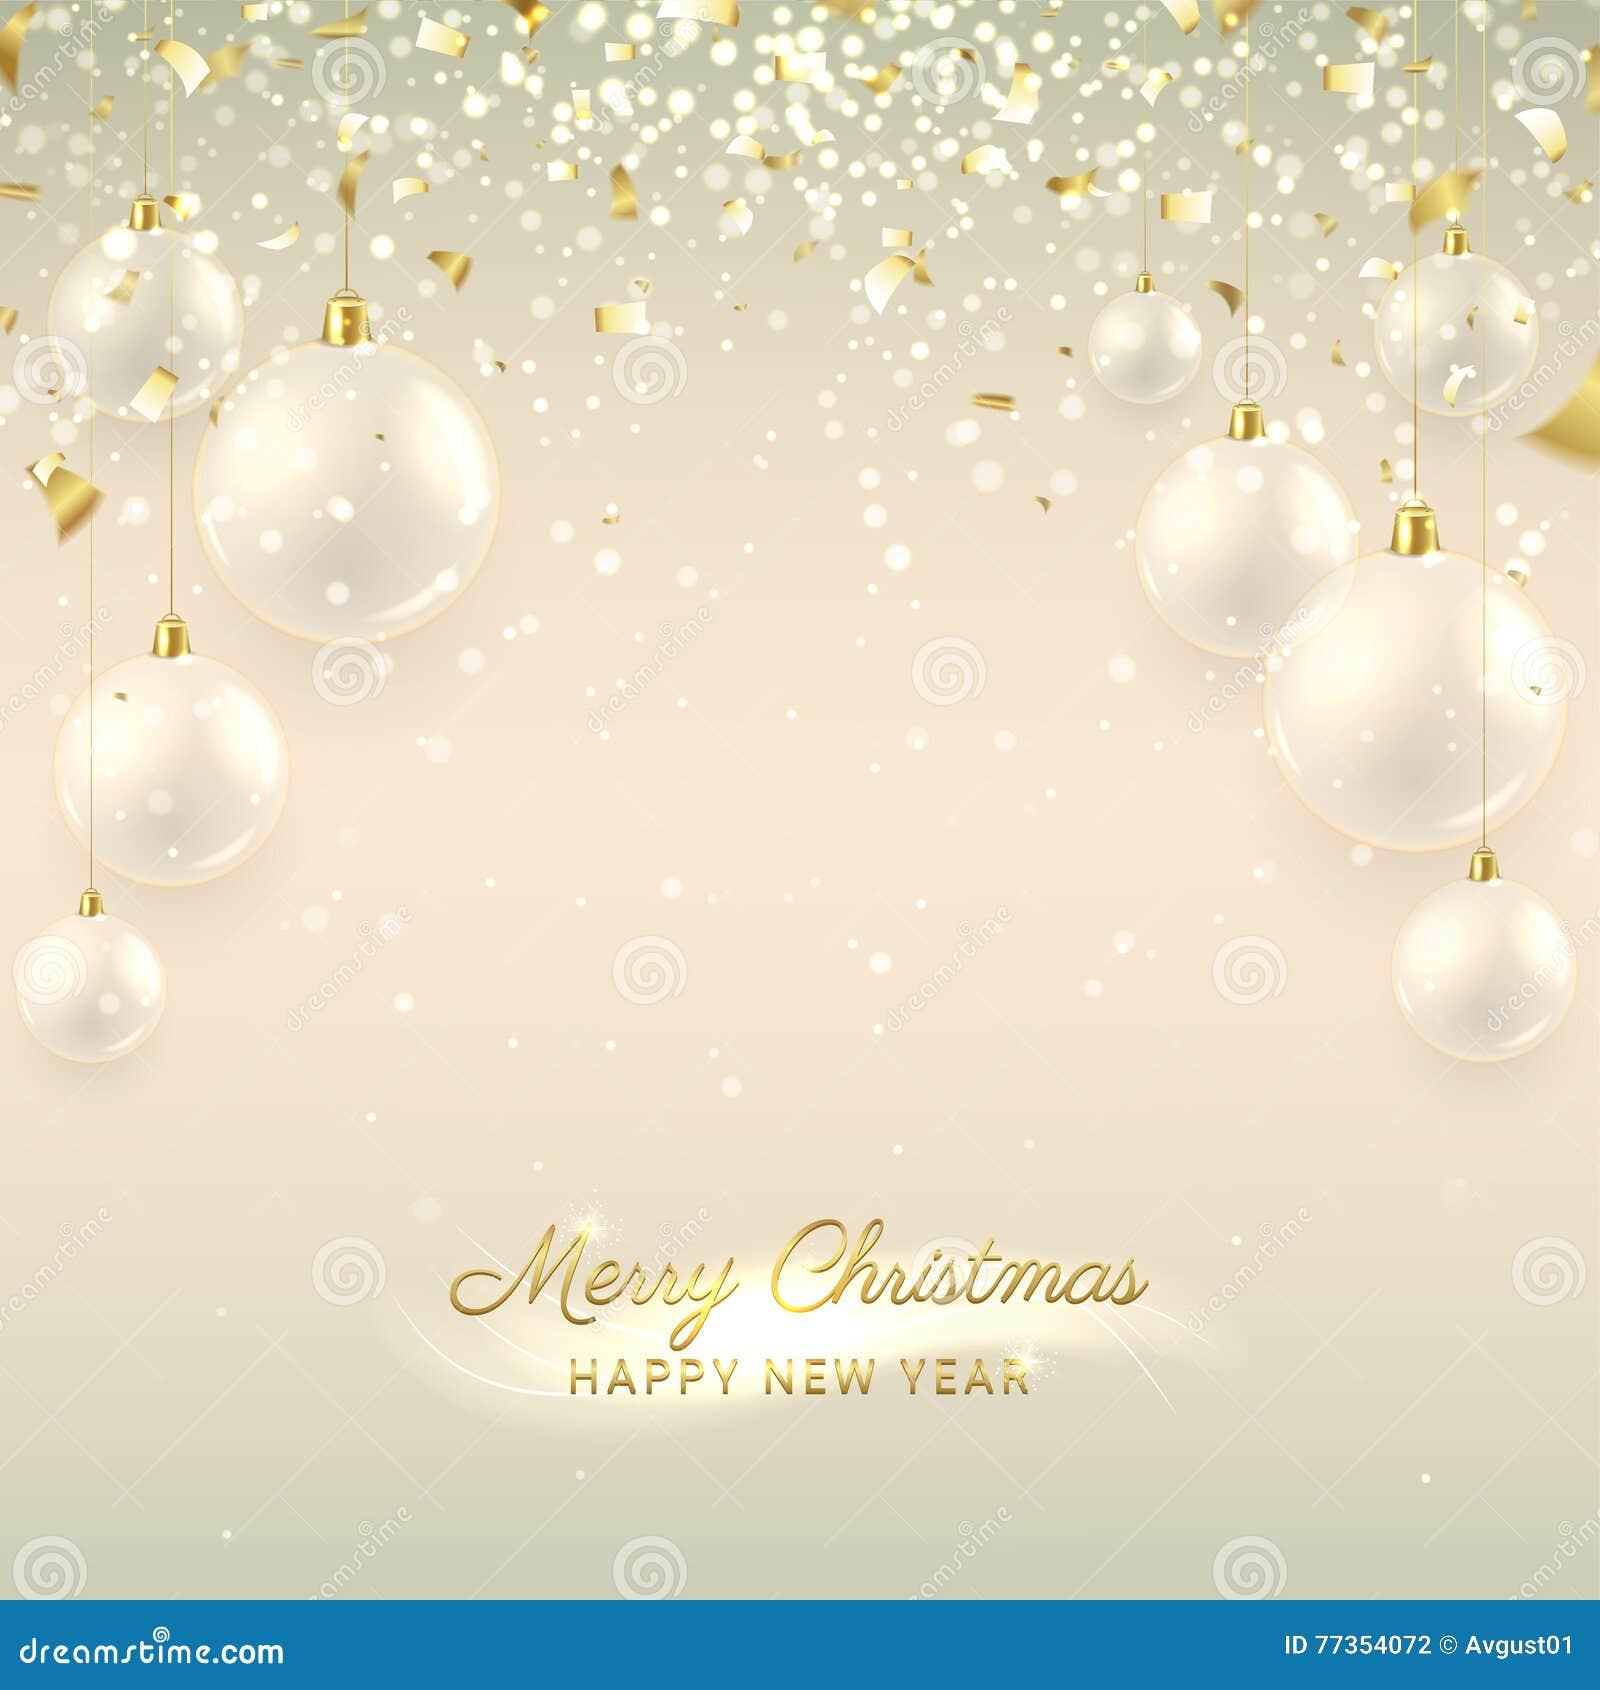 Elegant Christmas Banner With Glass Balls Stock Vector